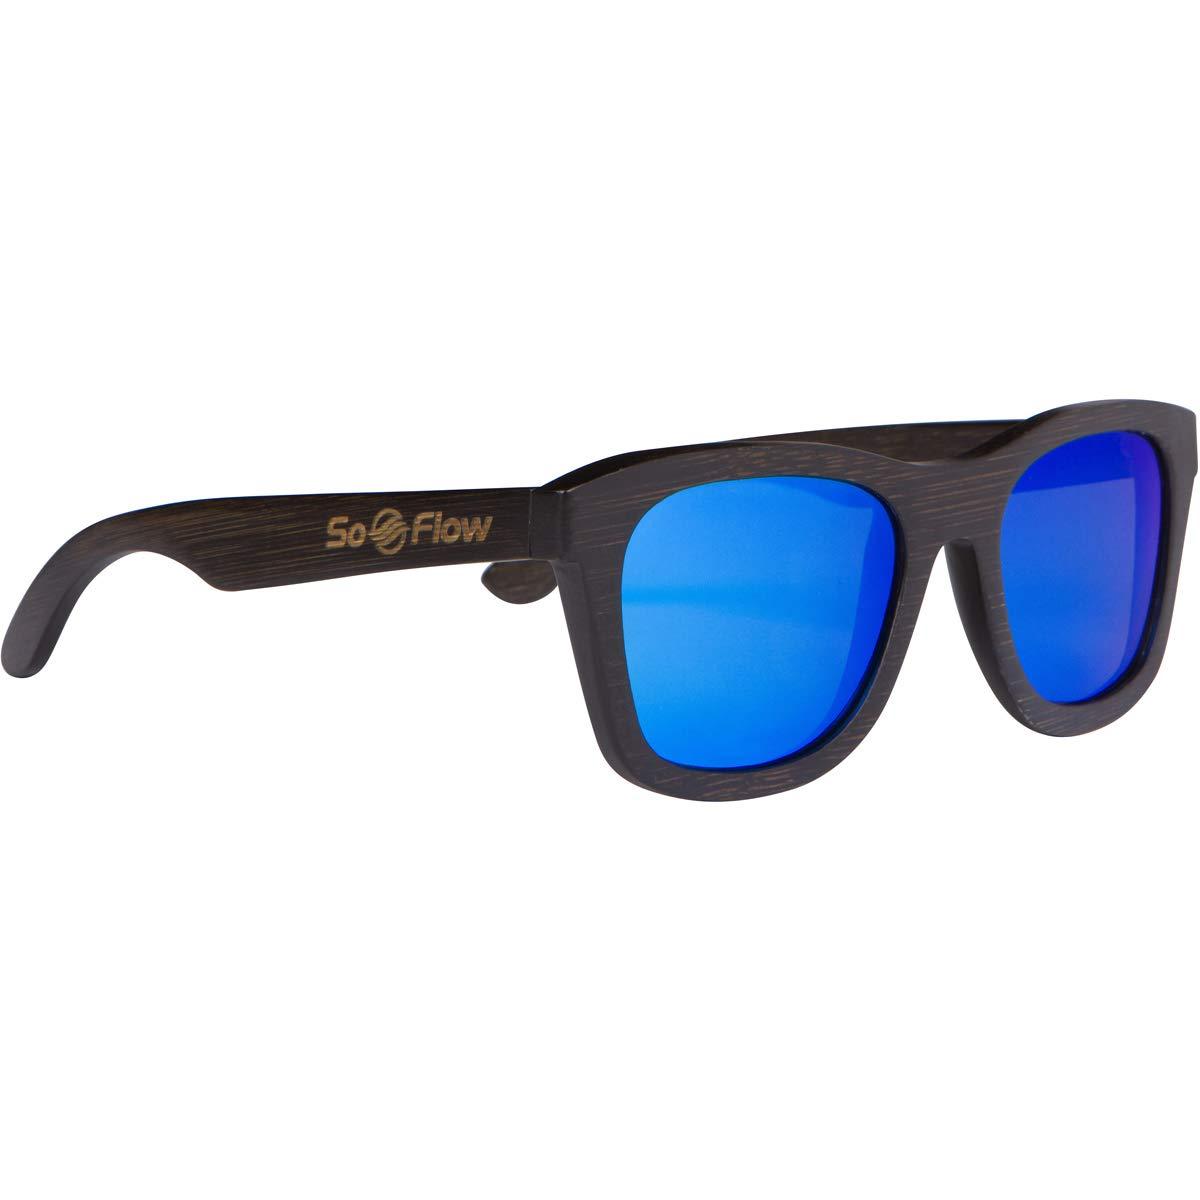 SoFlow Black Bamboo Wood Sunglasses Polarized bluee for Men & Women Wooden Shades